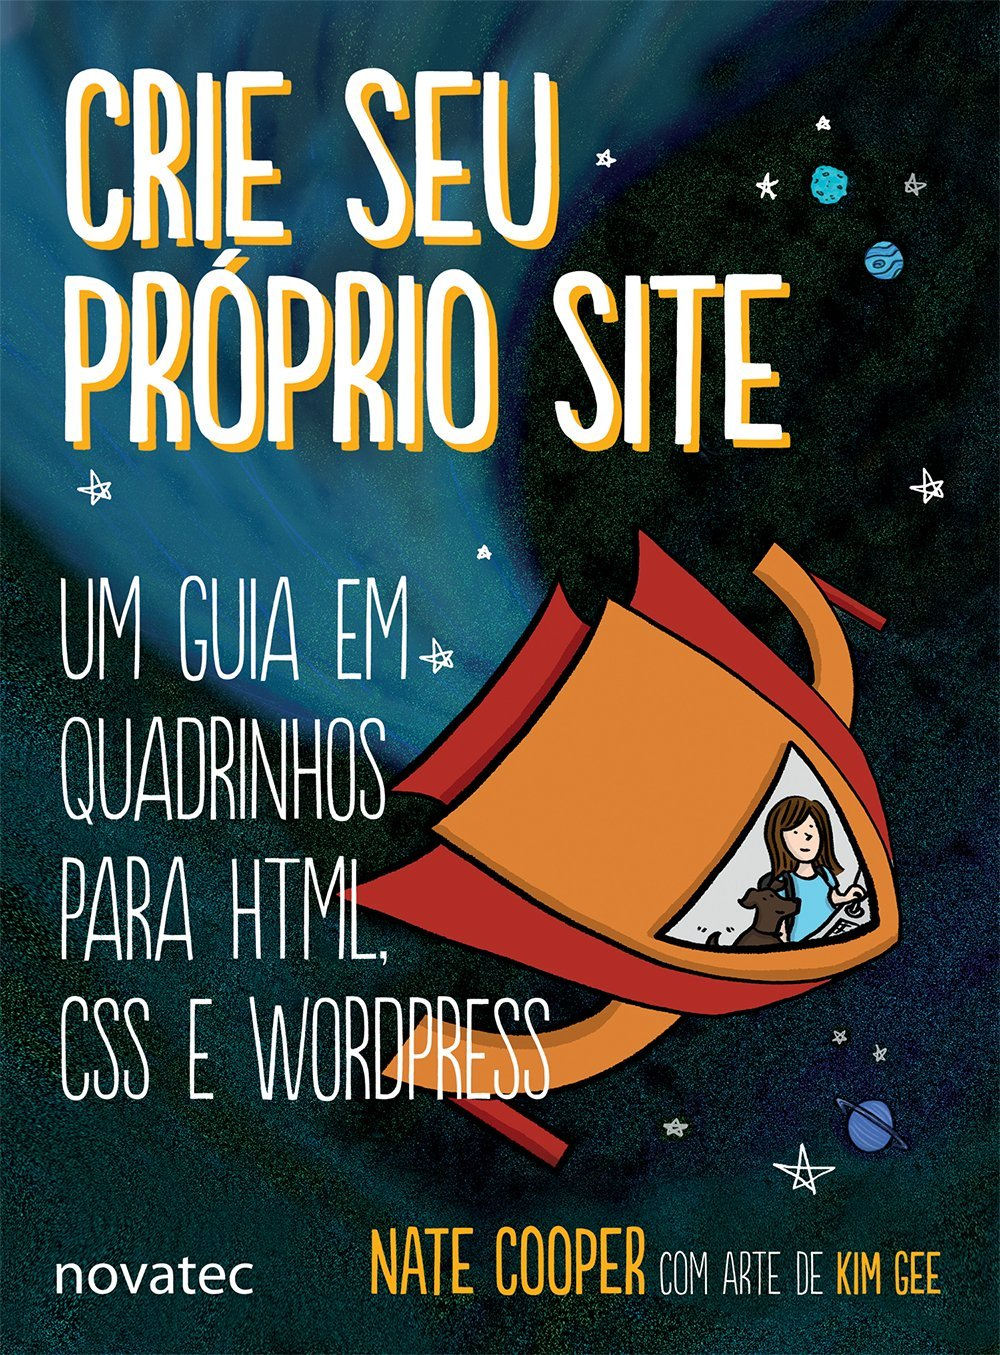 kim-gee-studio-graphic-design-build-your-own-website-portuguese